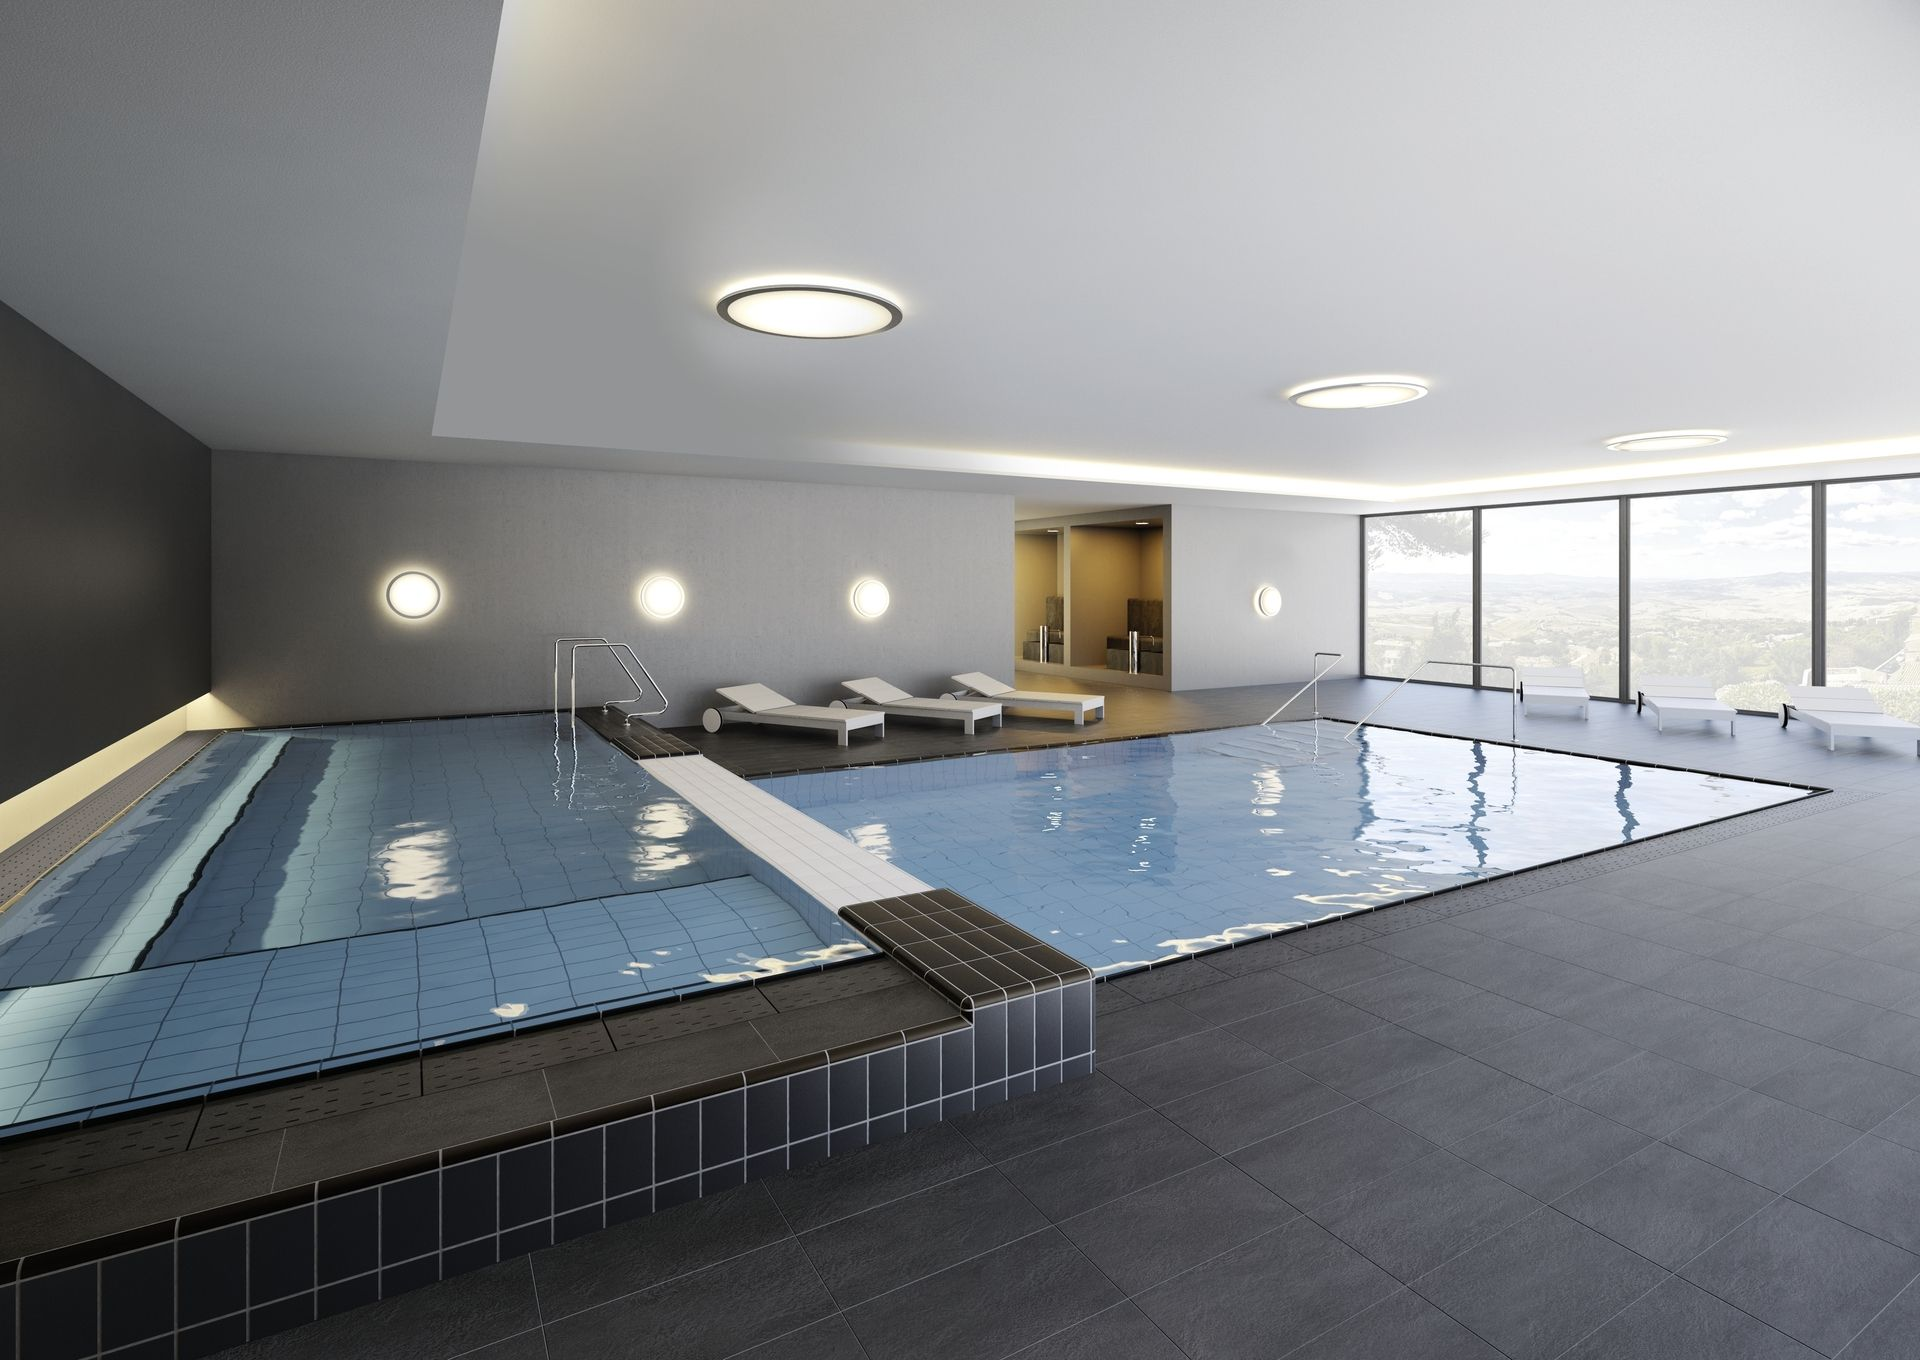 schwimmbadkeramik chroma pool b derspezialprogramm. Black Bedroom Furniture Sets. Home Design Ideas